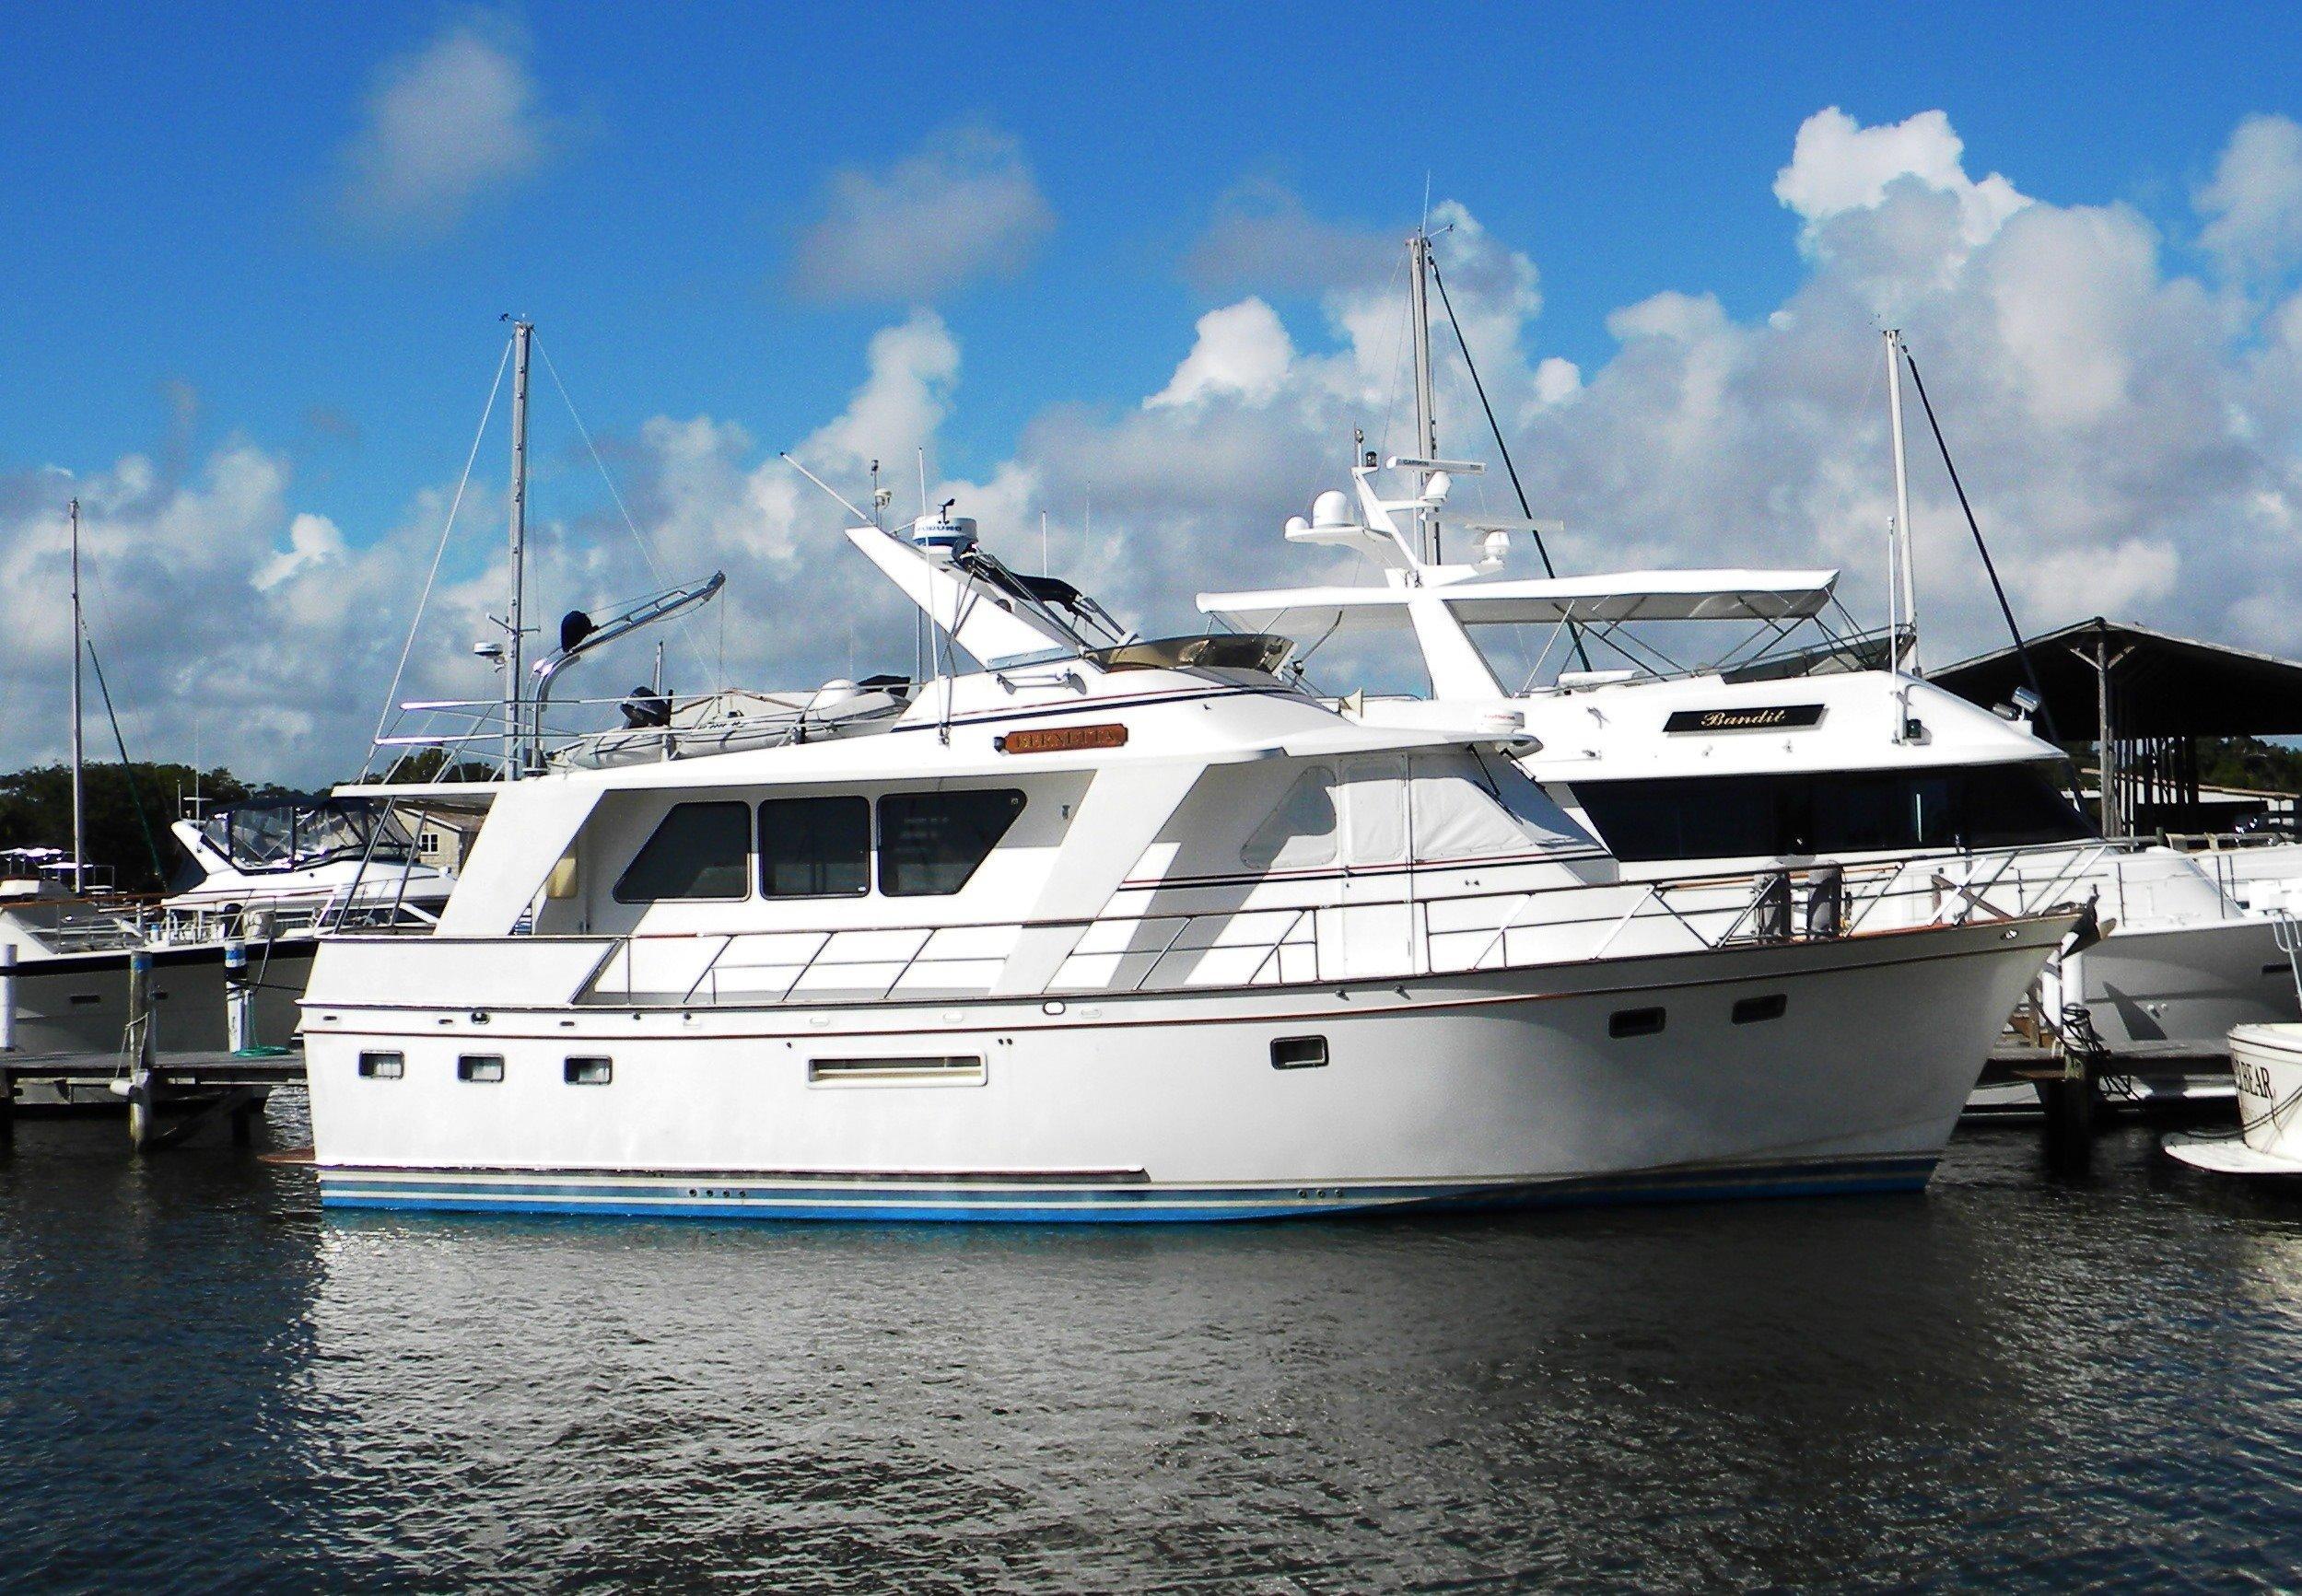 53 defever bernetta 1988 daytona beach denison yacht sales for Large motor yachts for sale